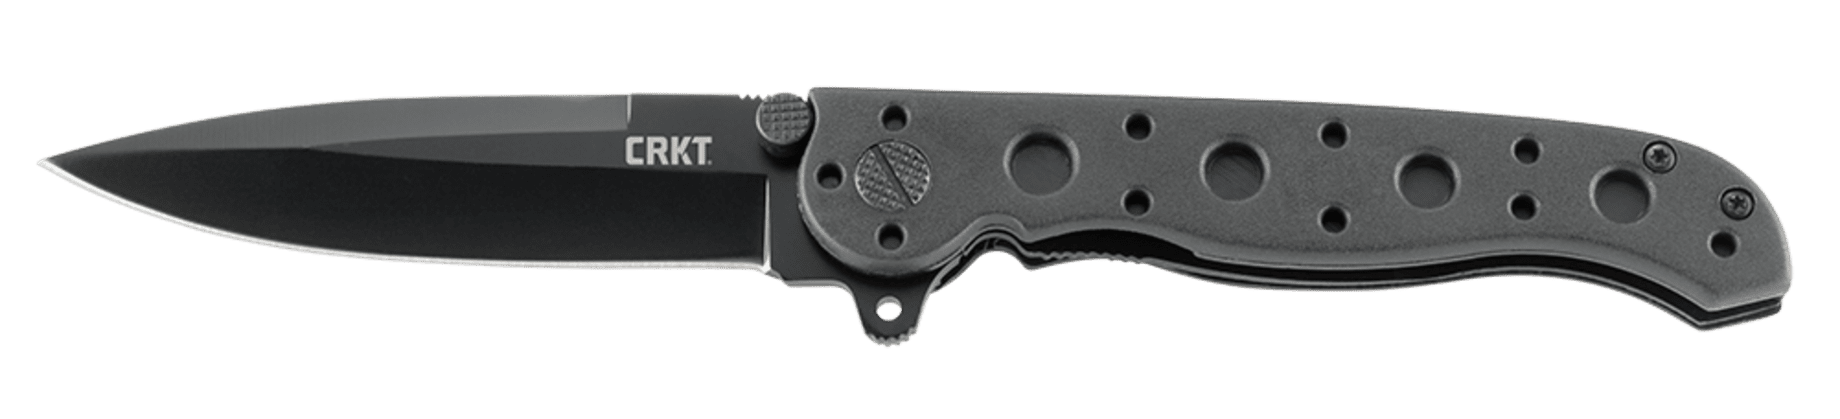 Spearpoint blade shape design